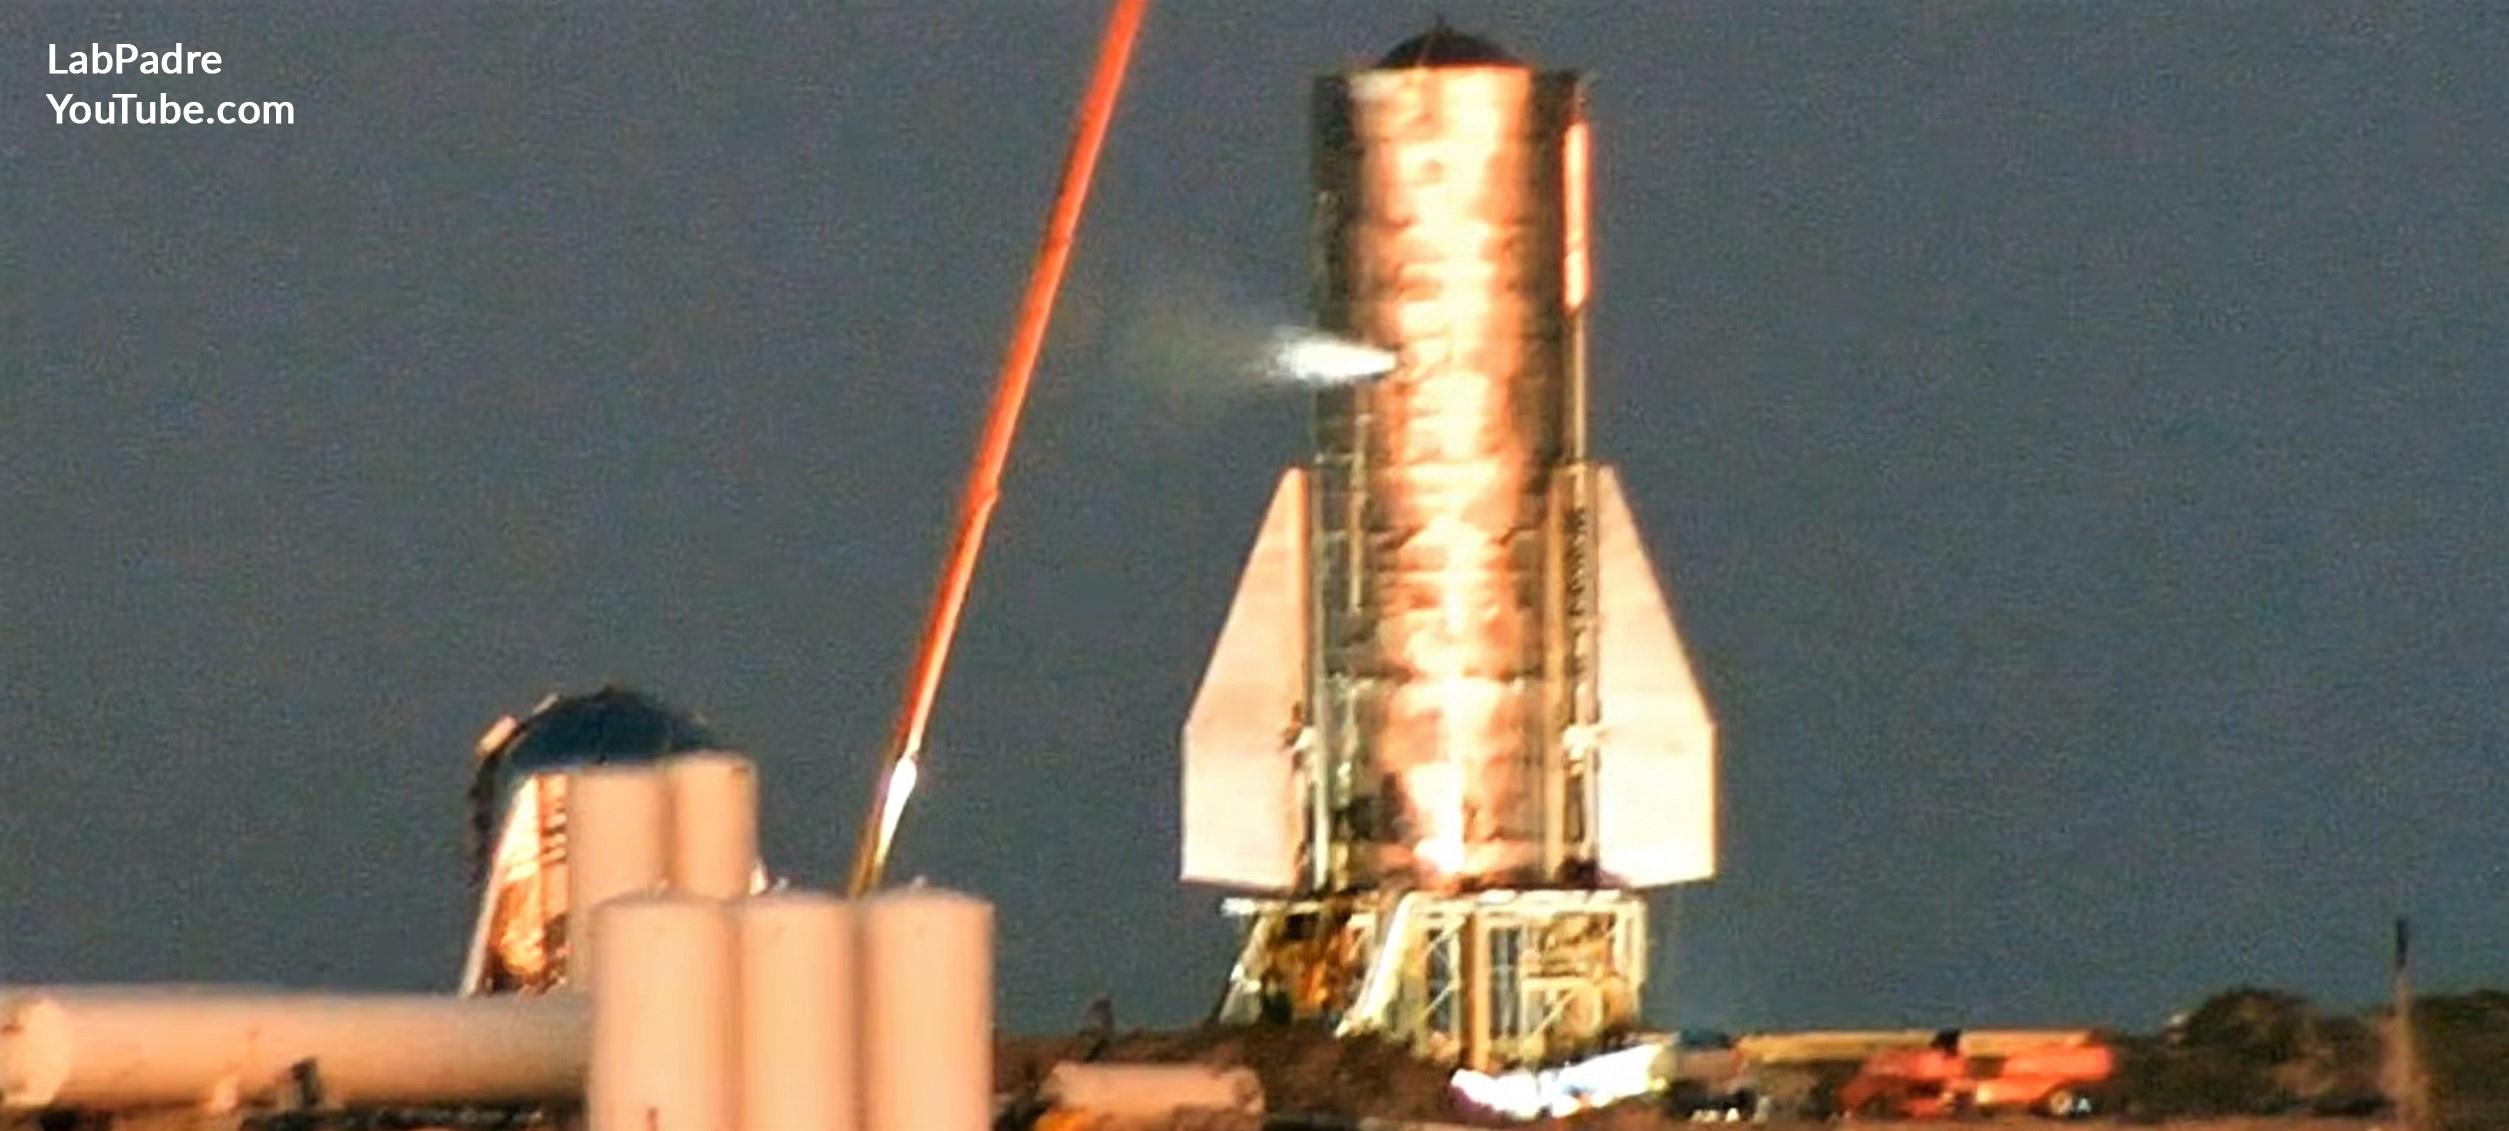 Starship Mk1 111819 (LabPadre) venting 1 crop